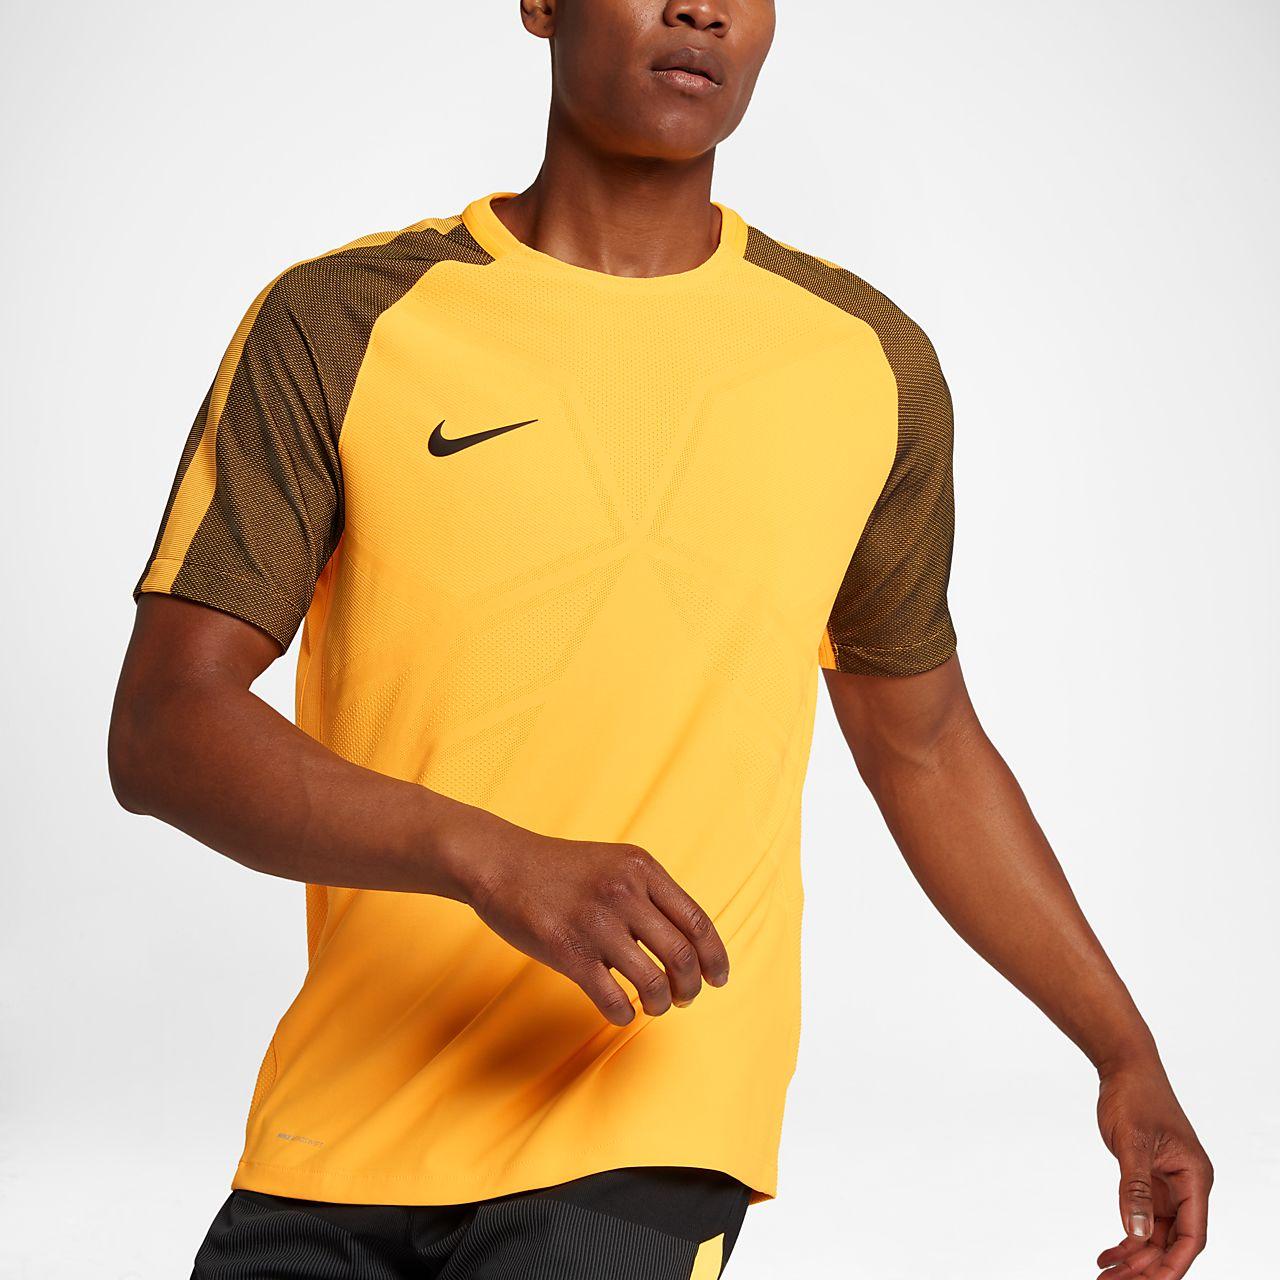 ... Top de fútbol de manga corta para hombre Nike Strike AeroSwift Strike 6f41d25fd58b2